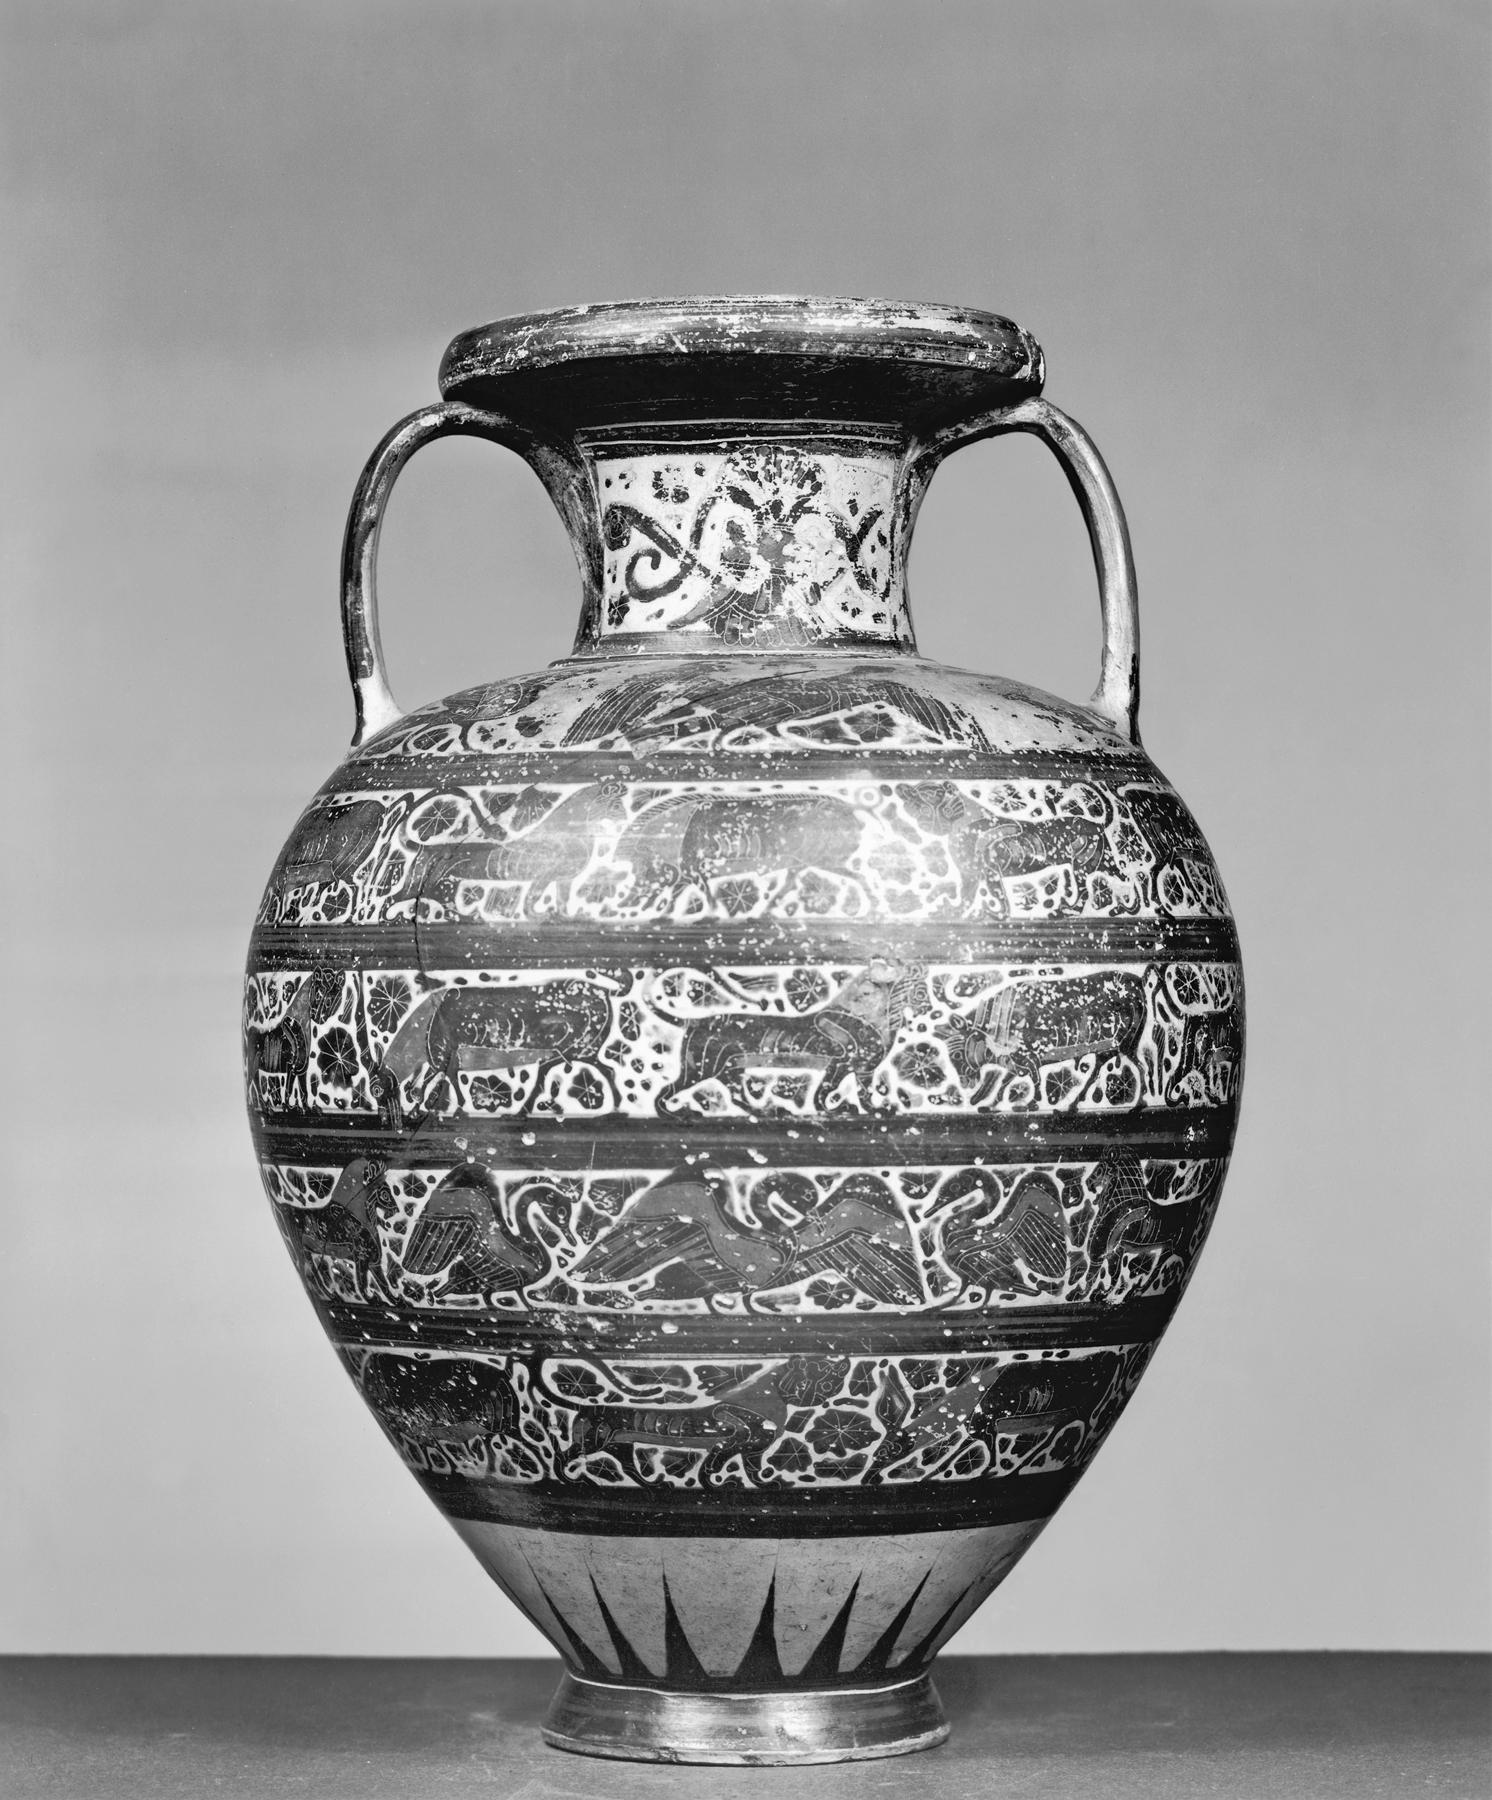 Filegreek early corinthian amphora with real and fantastic filegreek early corinthian amphora with real and fantastic animals walters 482033 reviewsmspy